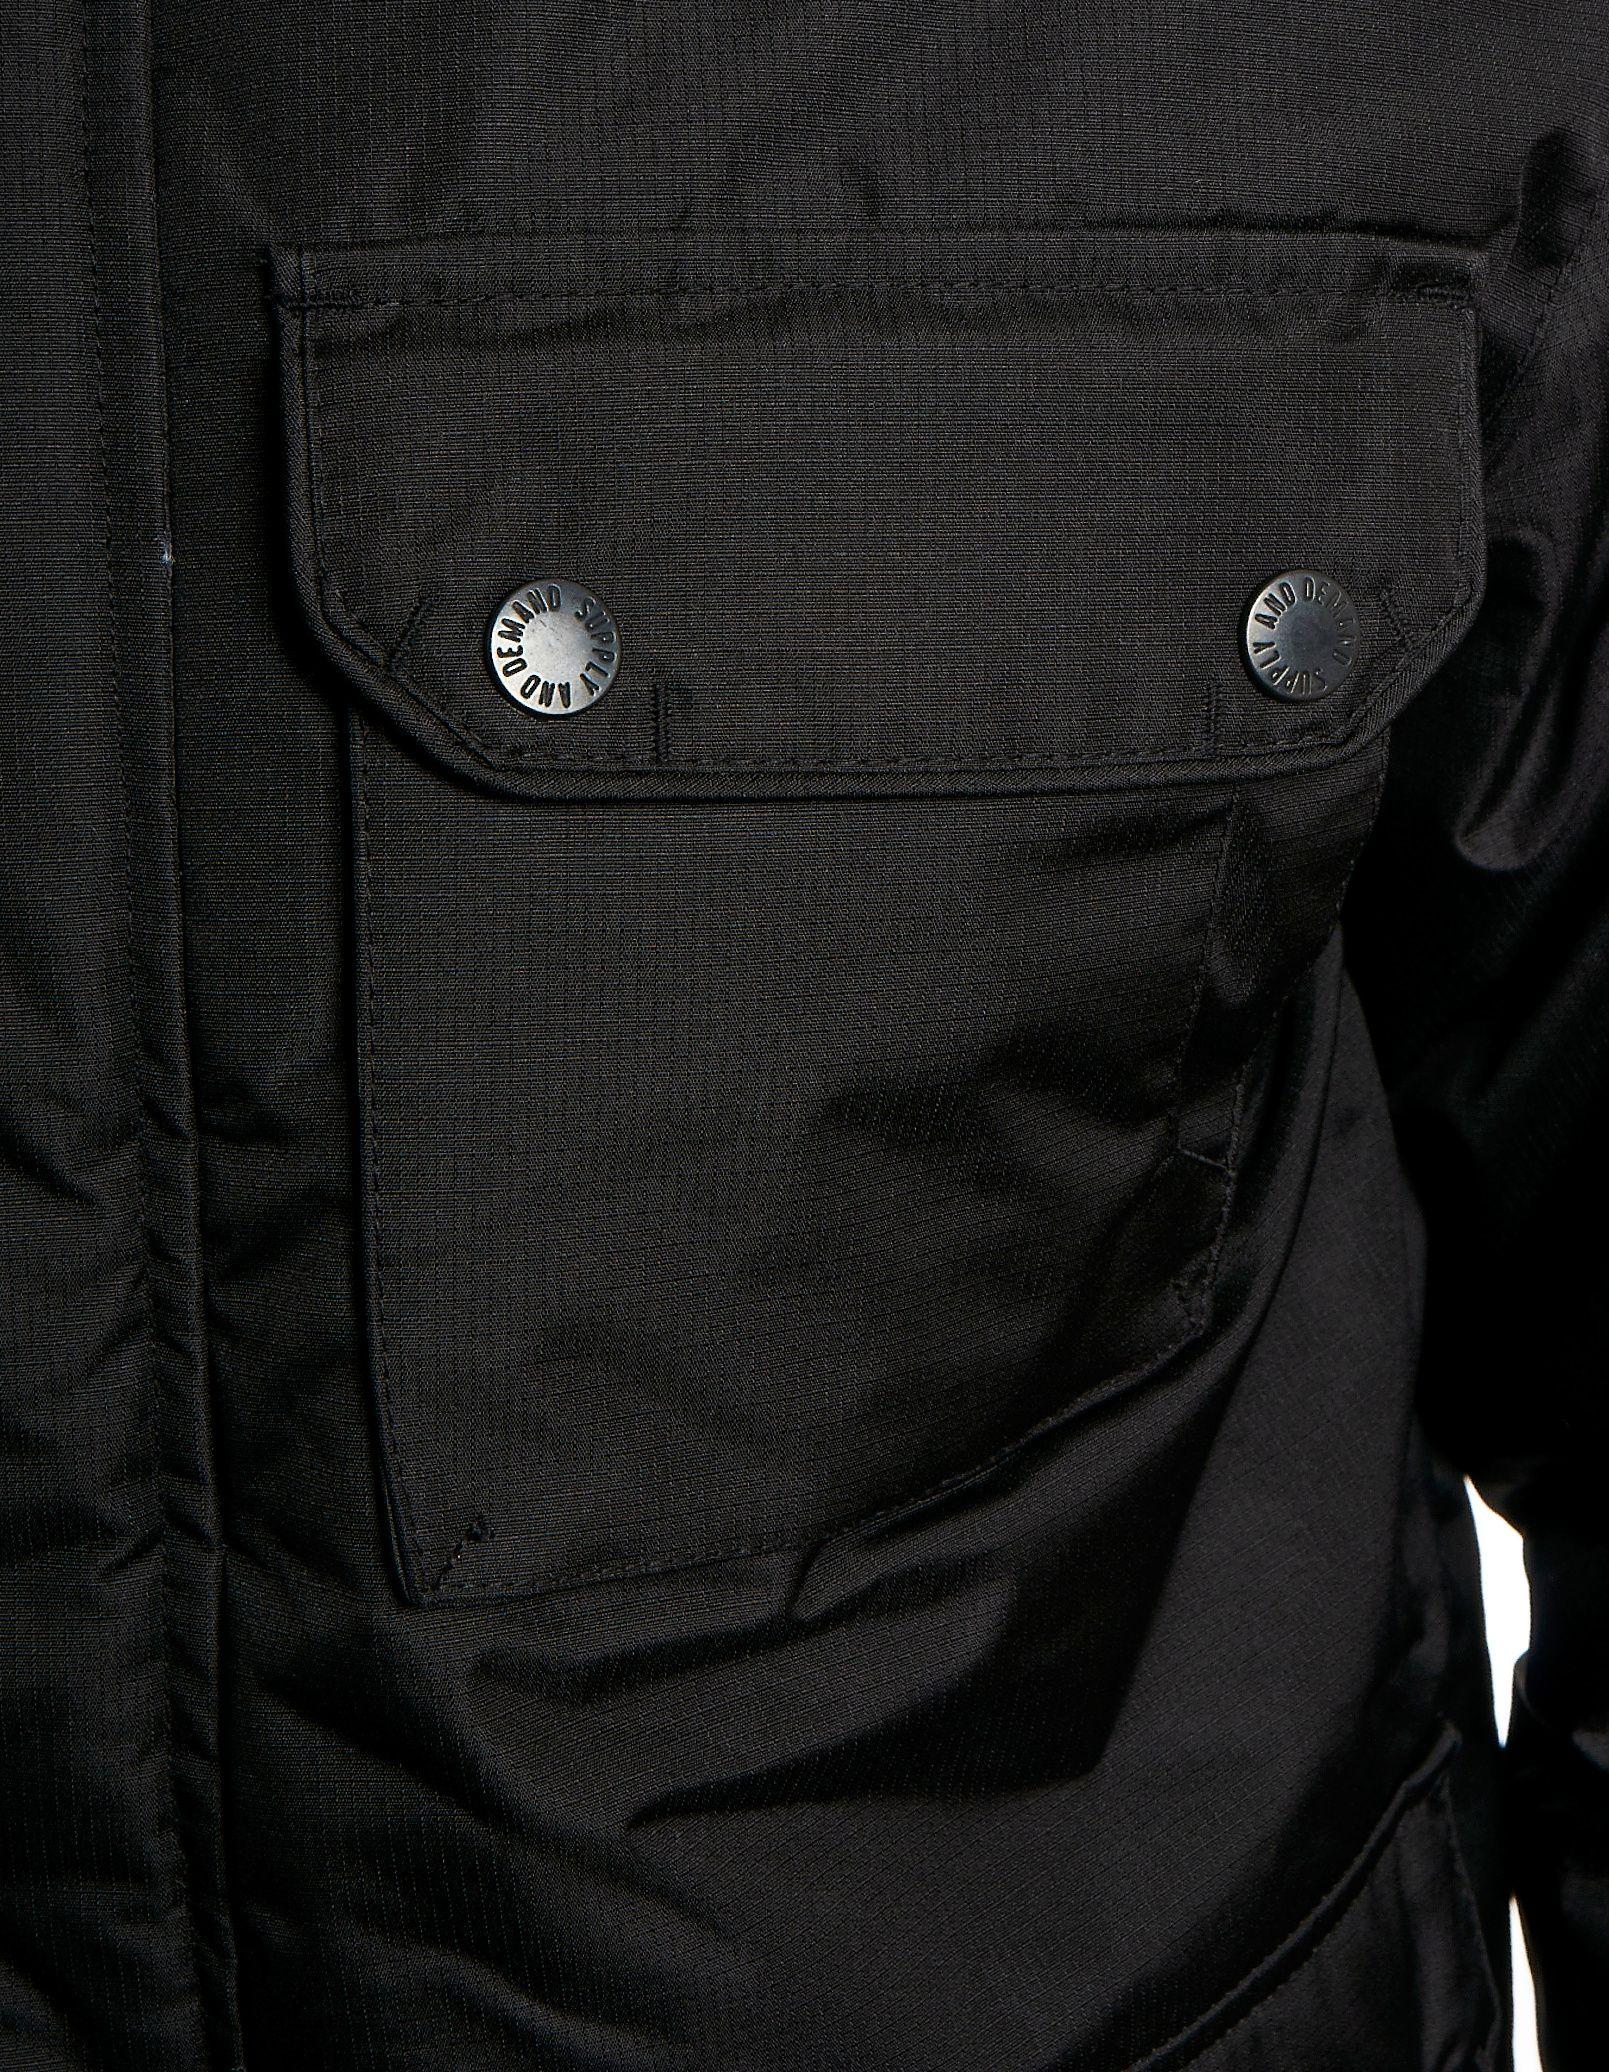 Supply & Demand Tour Jacket